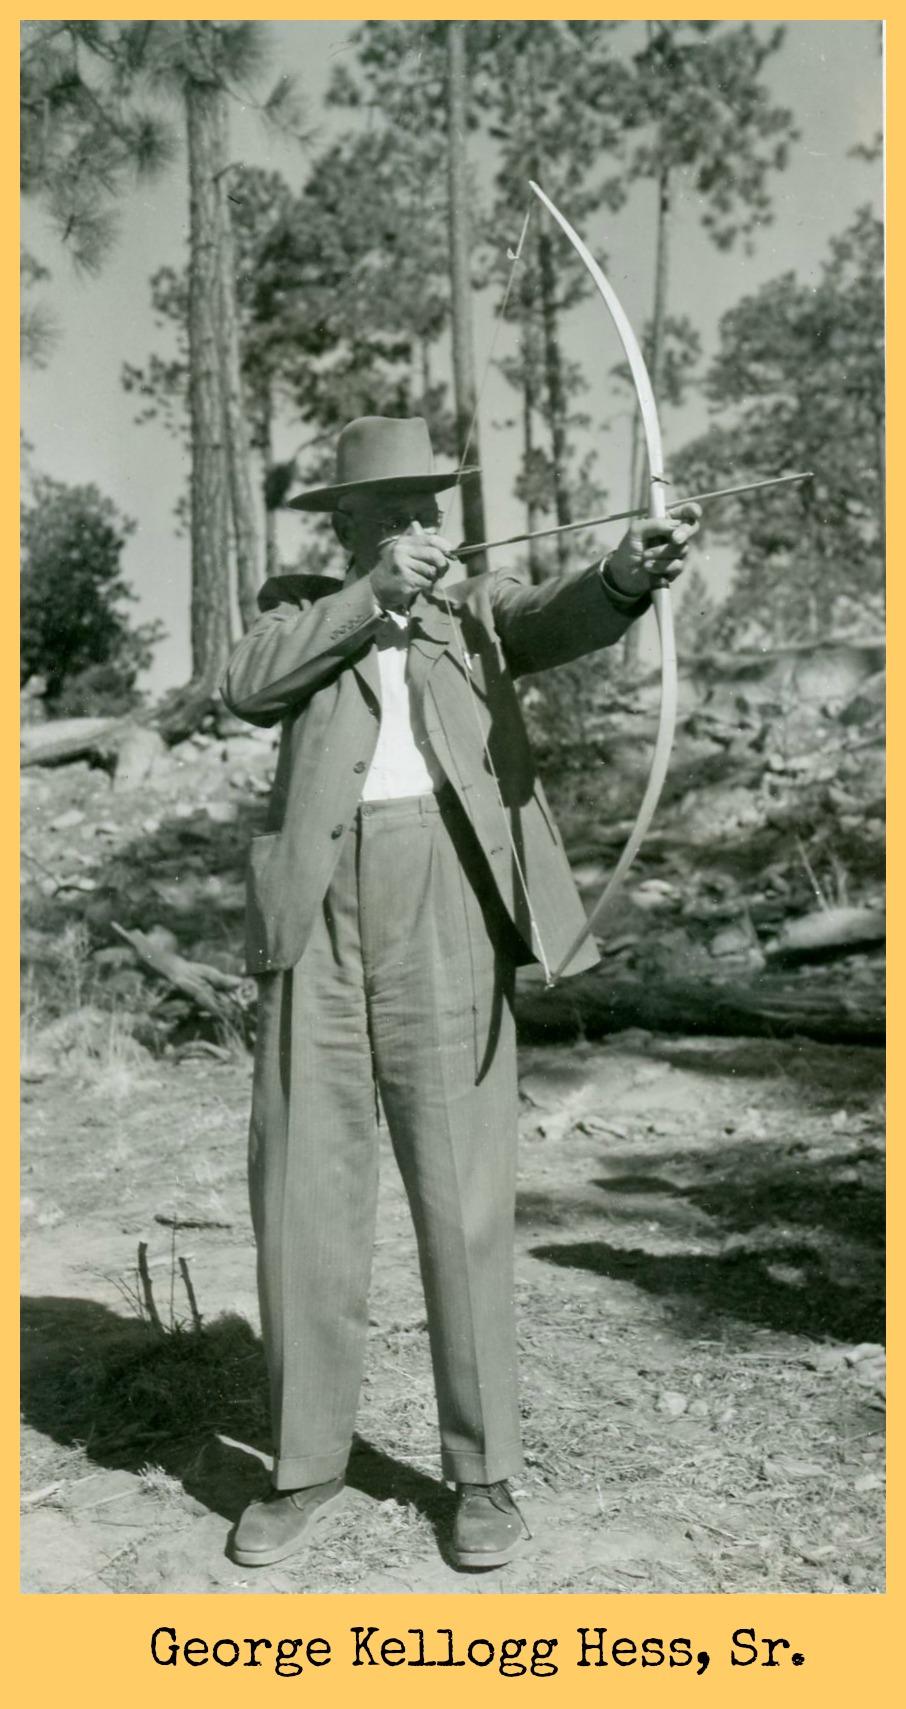 George Kellogg Hess Sr. with bow and arrow